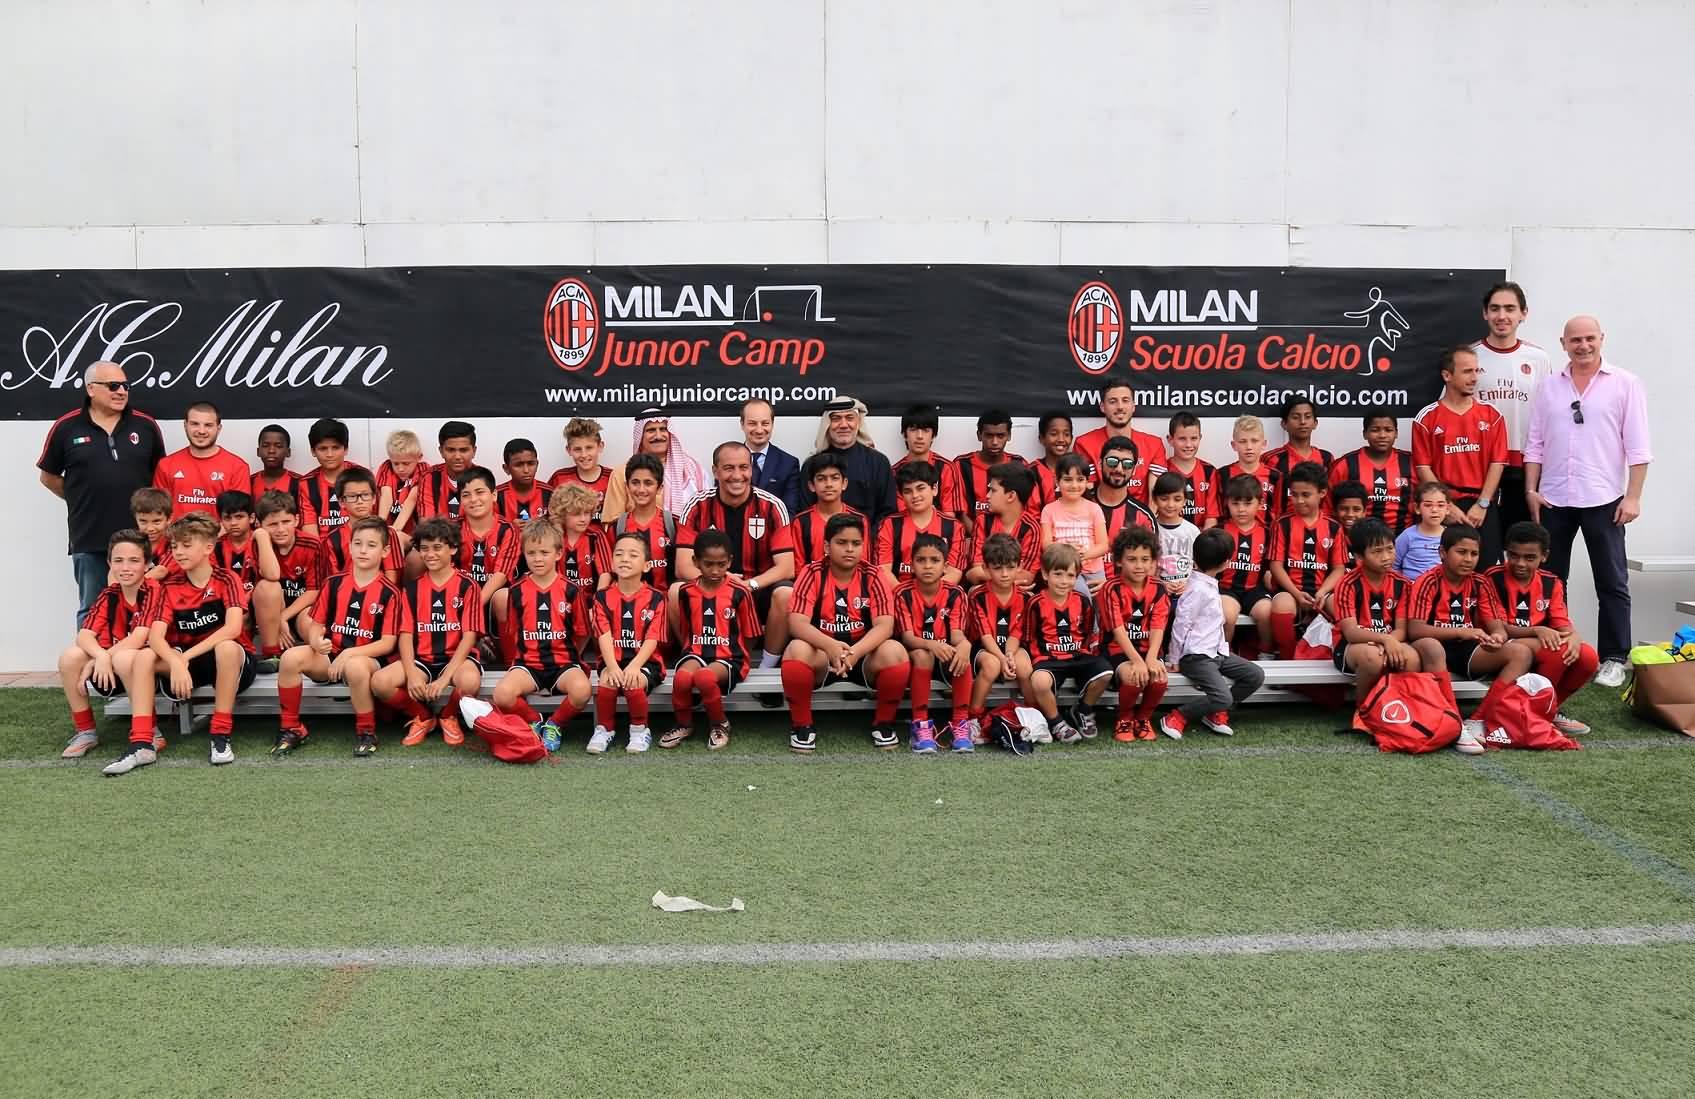 Photo of معسكر إي سي ميلان لكرة القدم للناشئين يشارك في مبادرة خيرية خاصة للأيتام و القصر